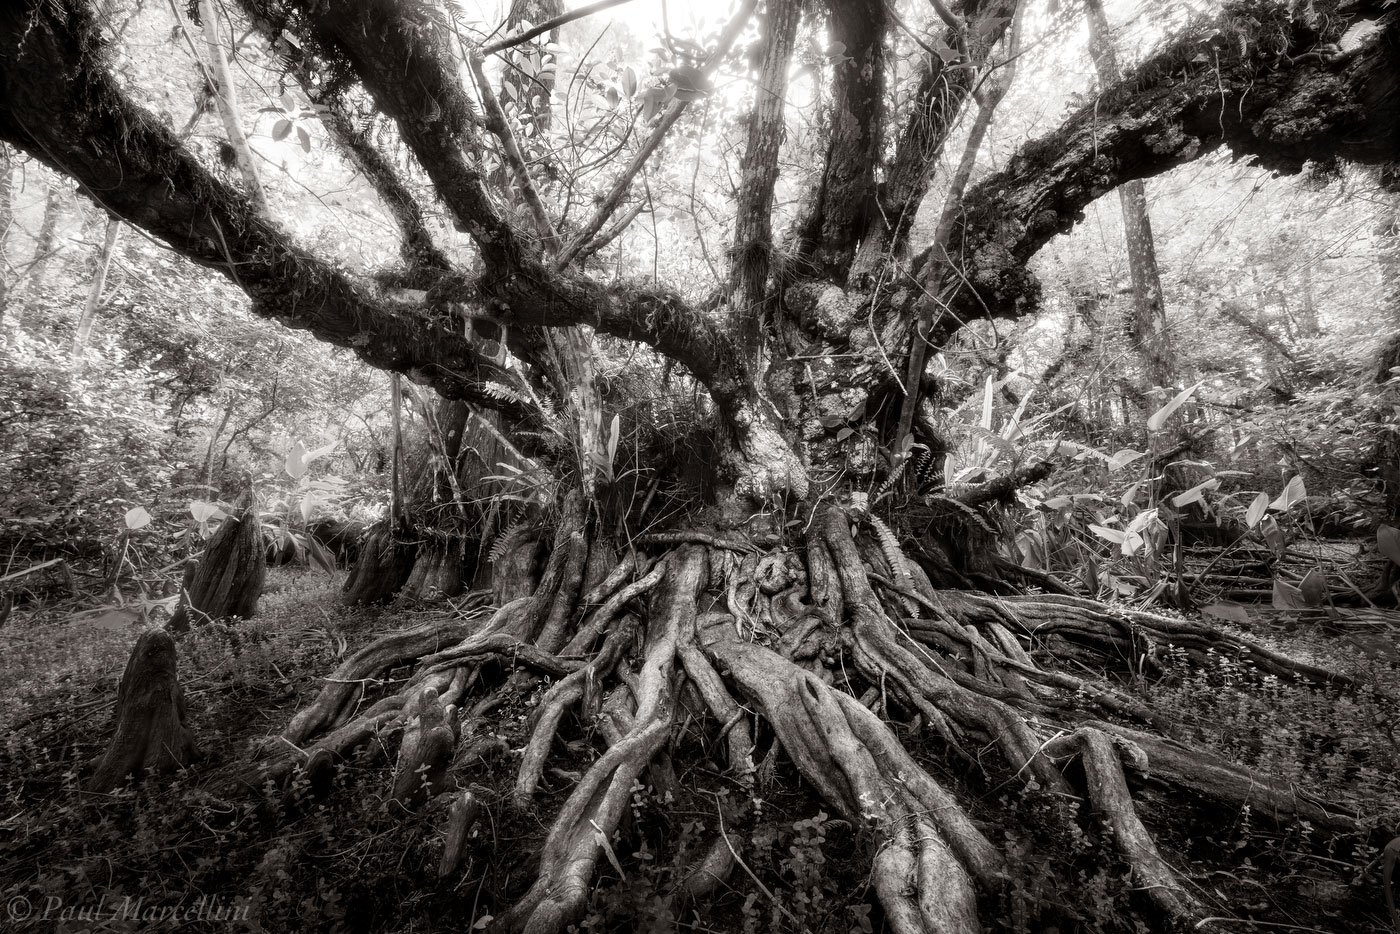 pond apple, big cypress national preserve, florida, nature, photography, photo